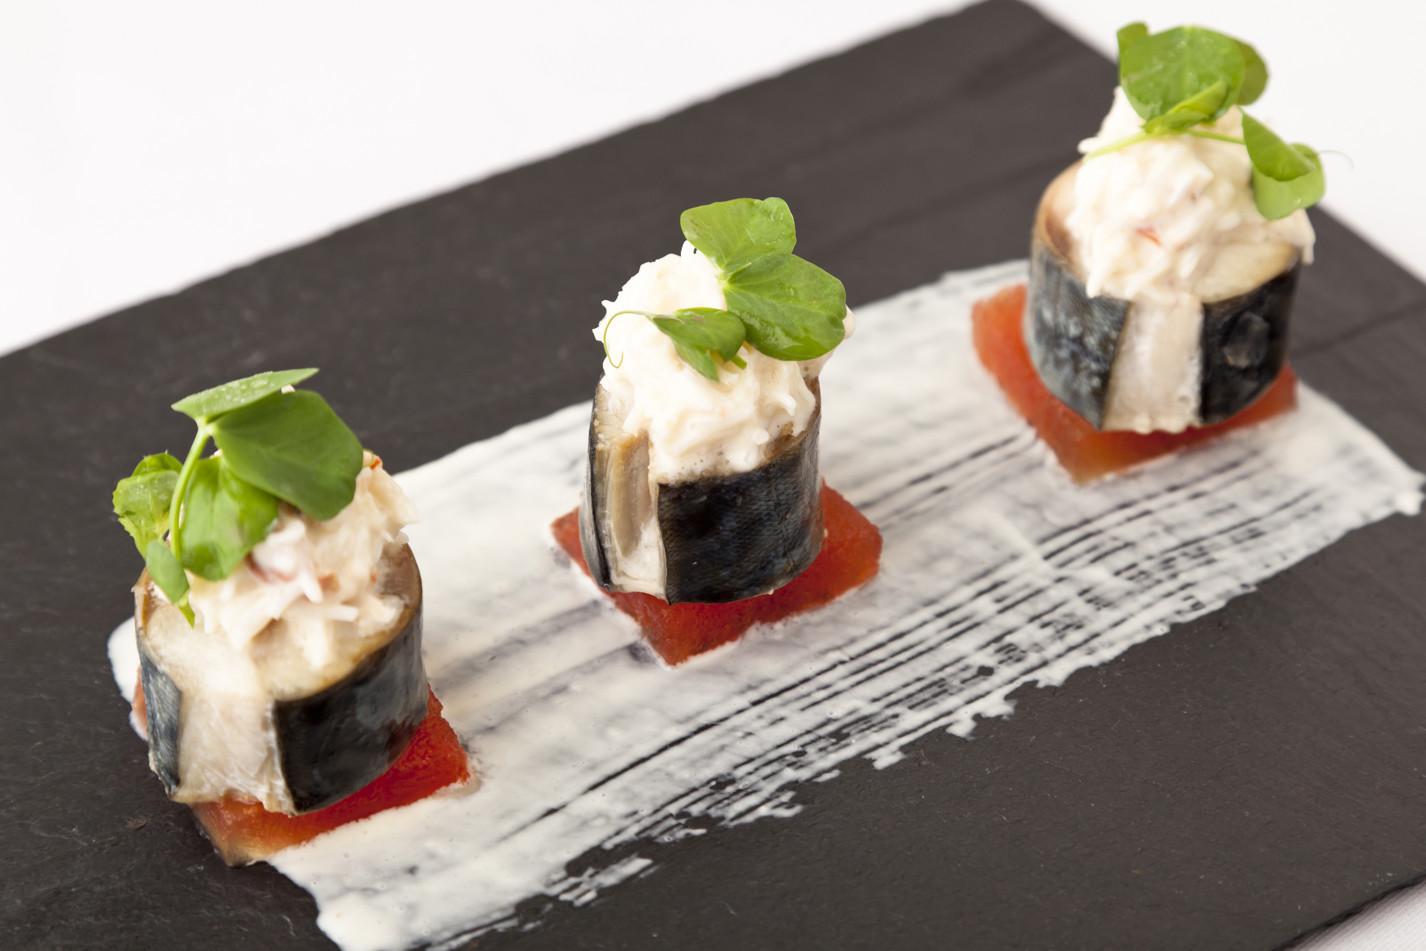 Mackerel with compressed watermelon, crab and horseradish salad